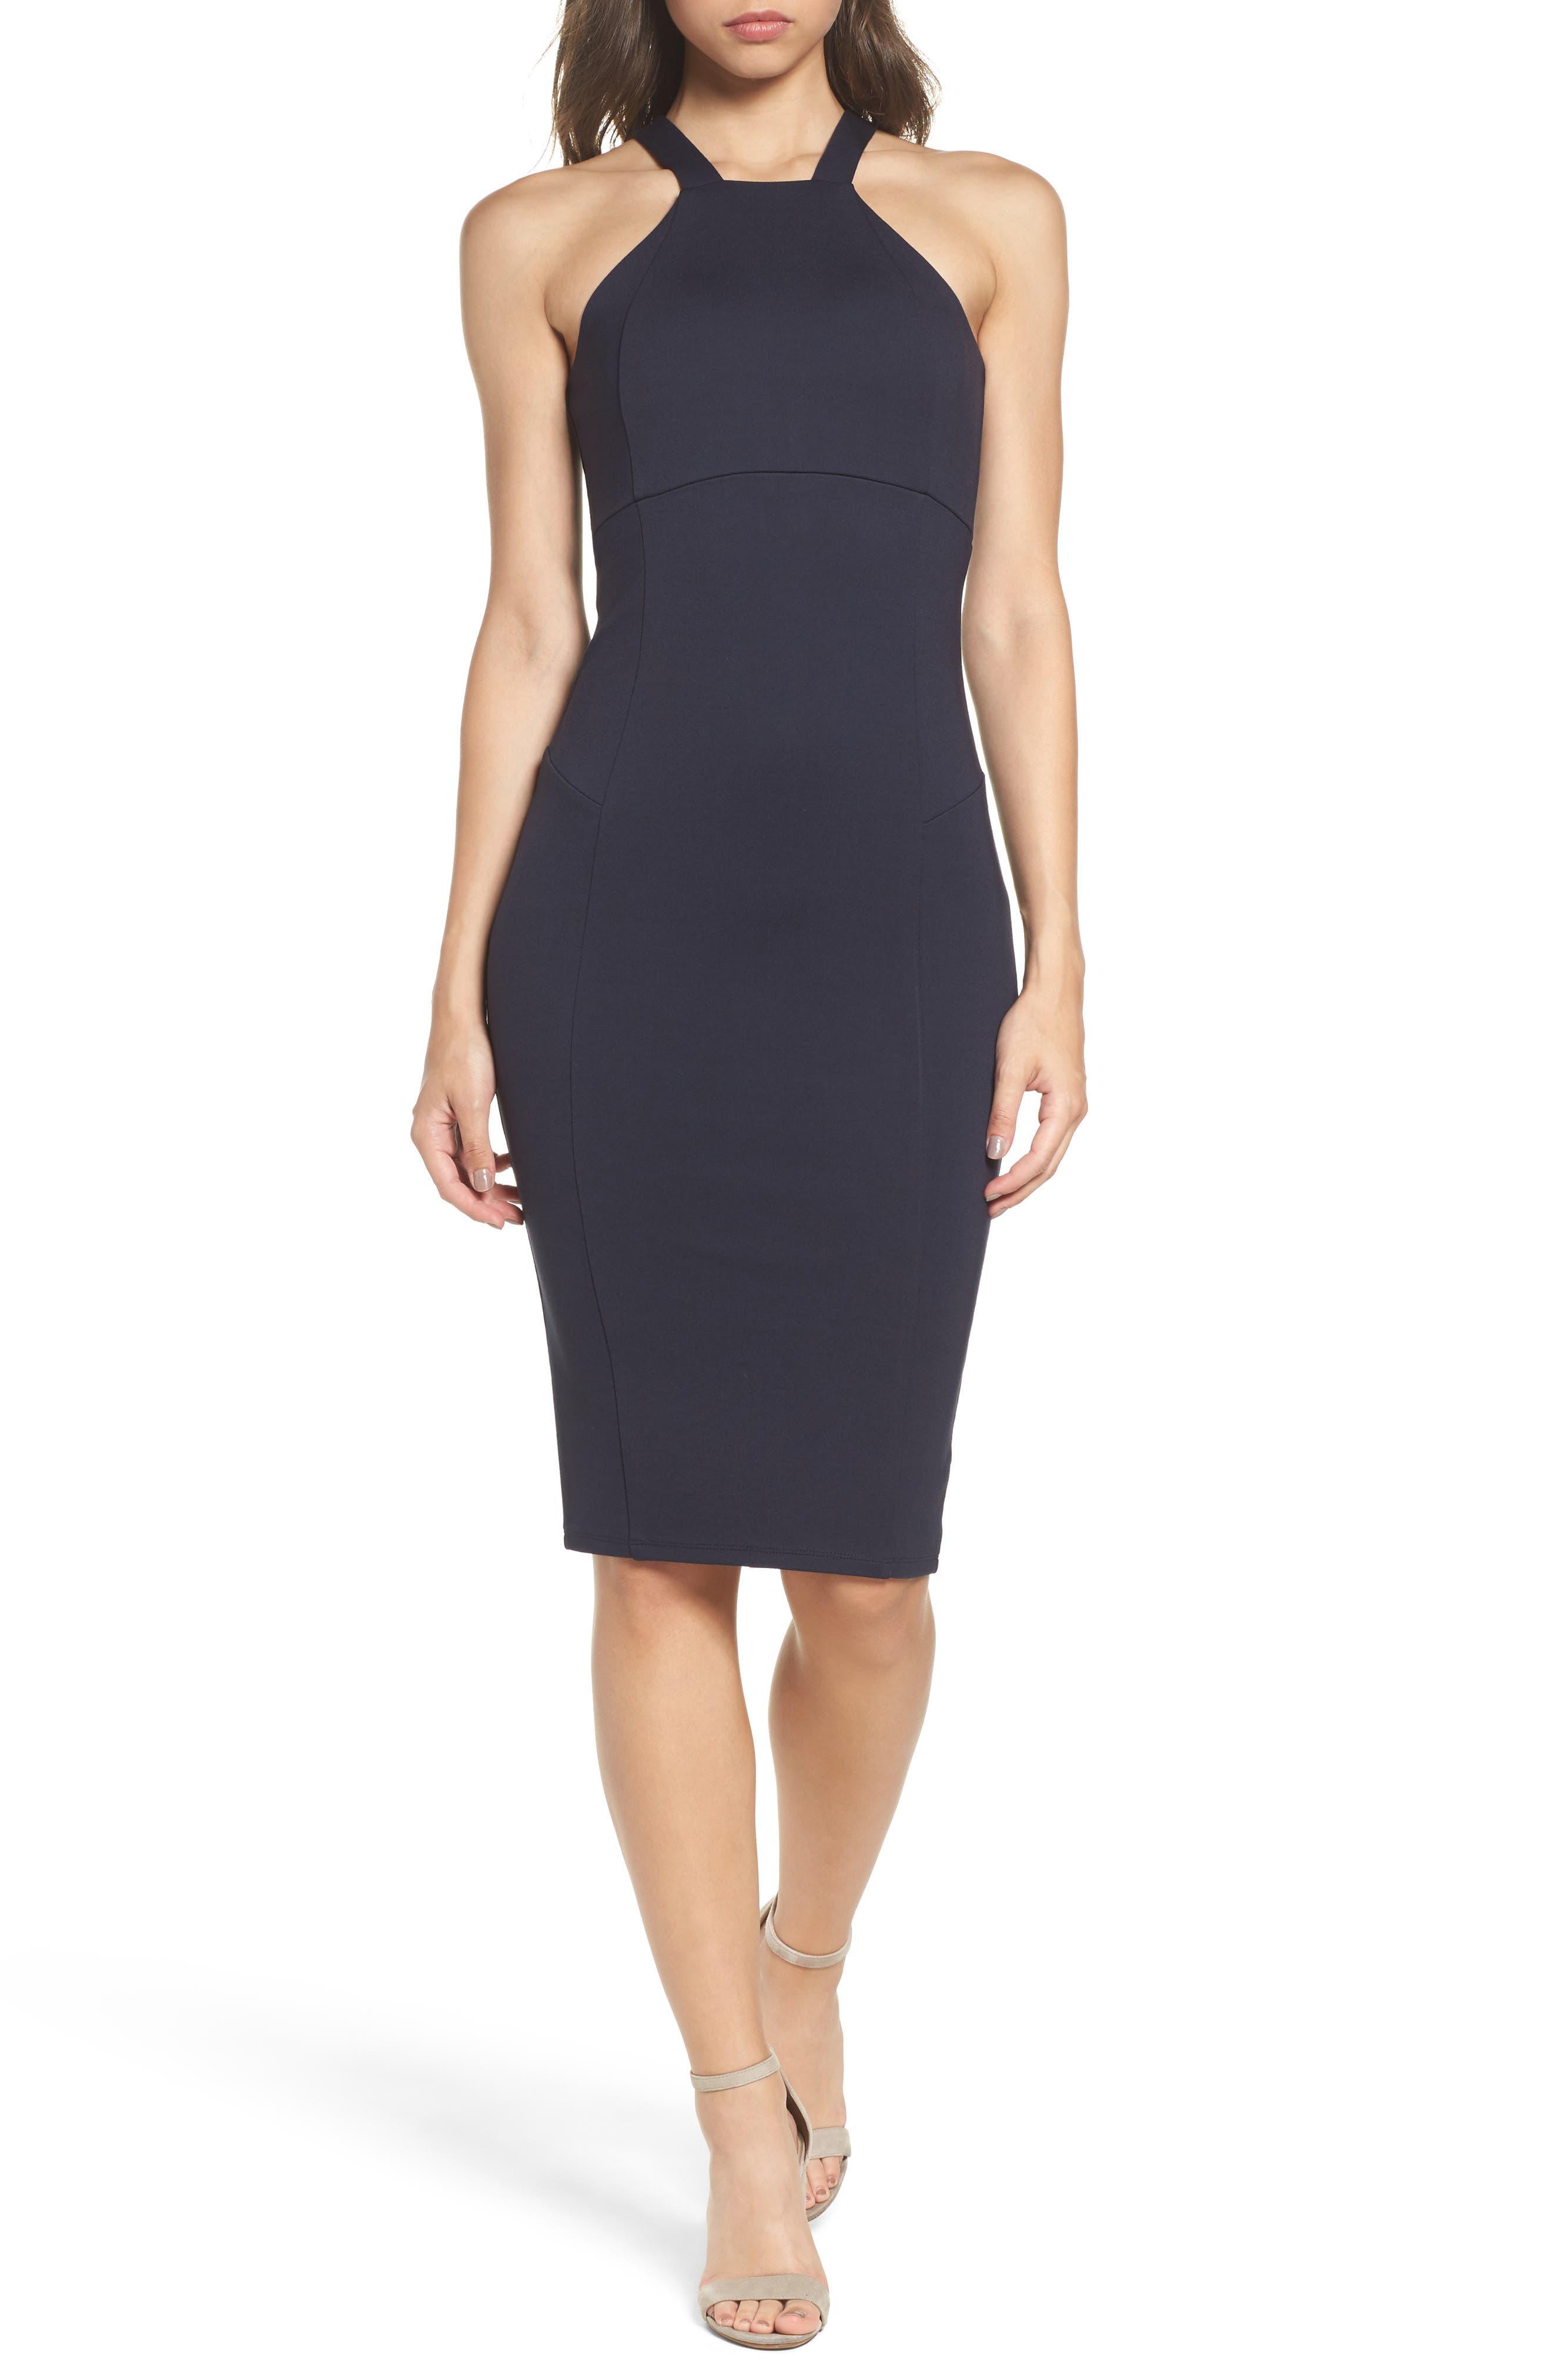 Betina Halter Body-Con Dress,                         Main,                         color, Navy